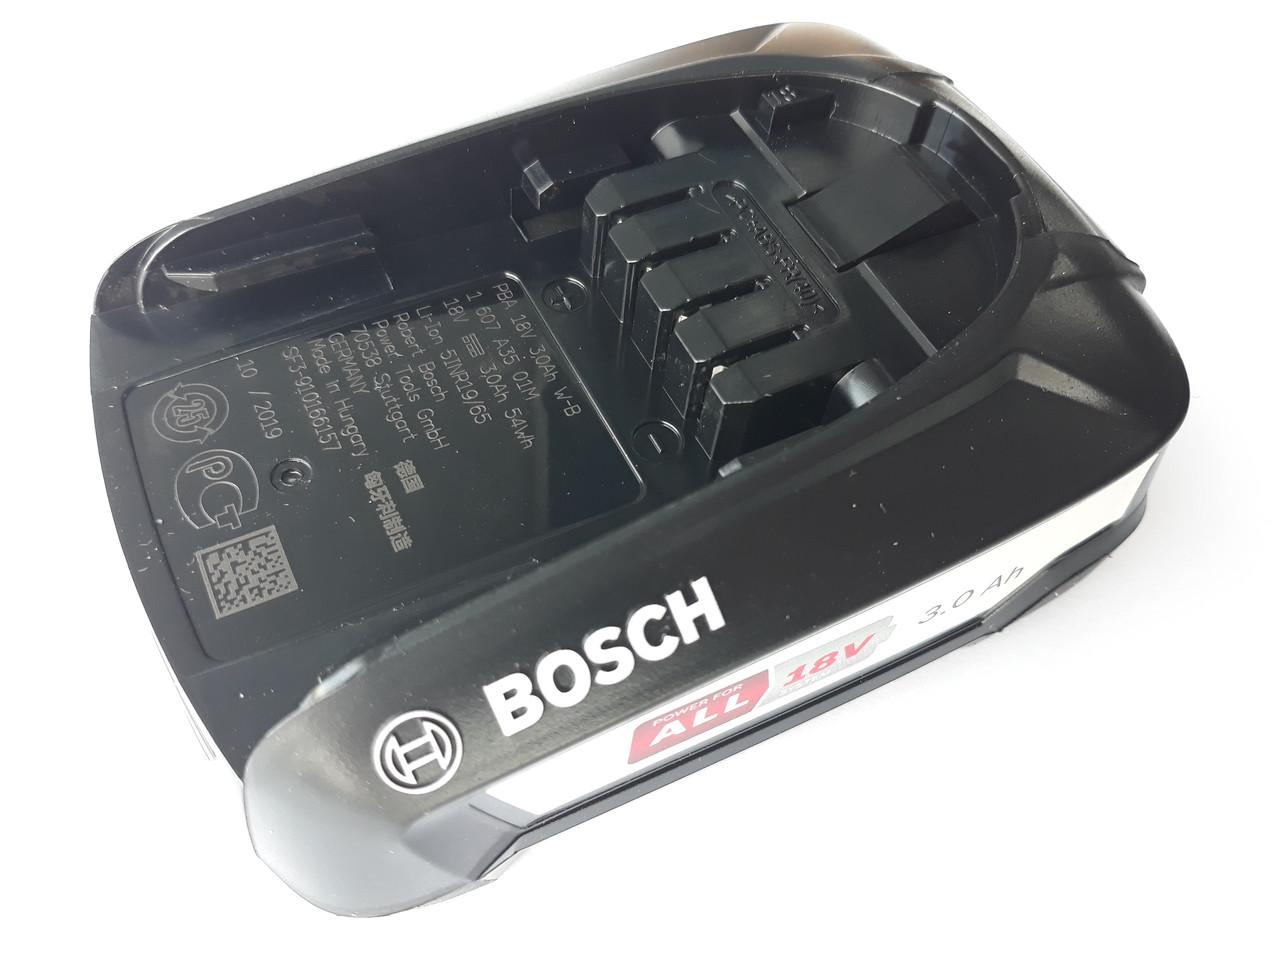 Аккумулятор Power4All для пылесоса Bosch, 17002207